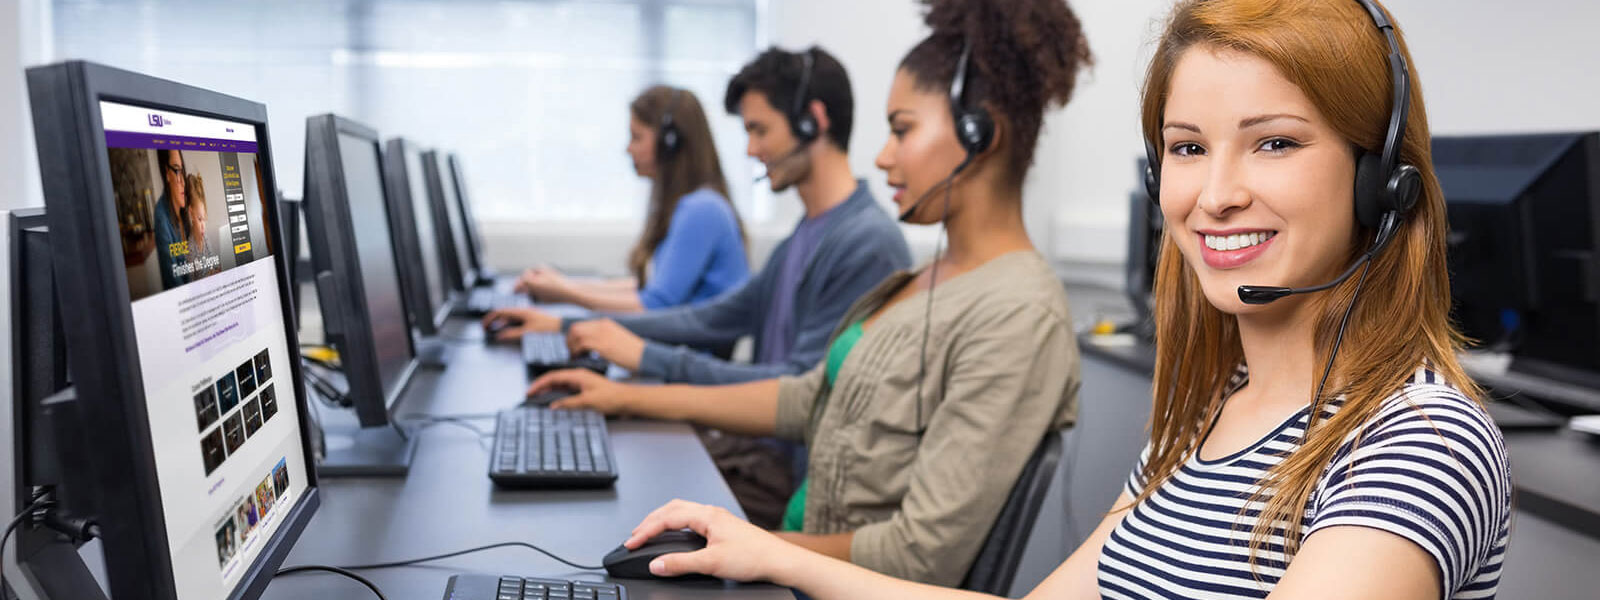 customer support team responding to calls